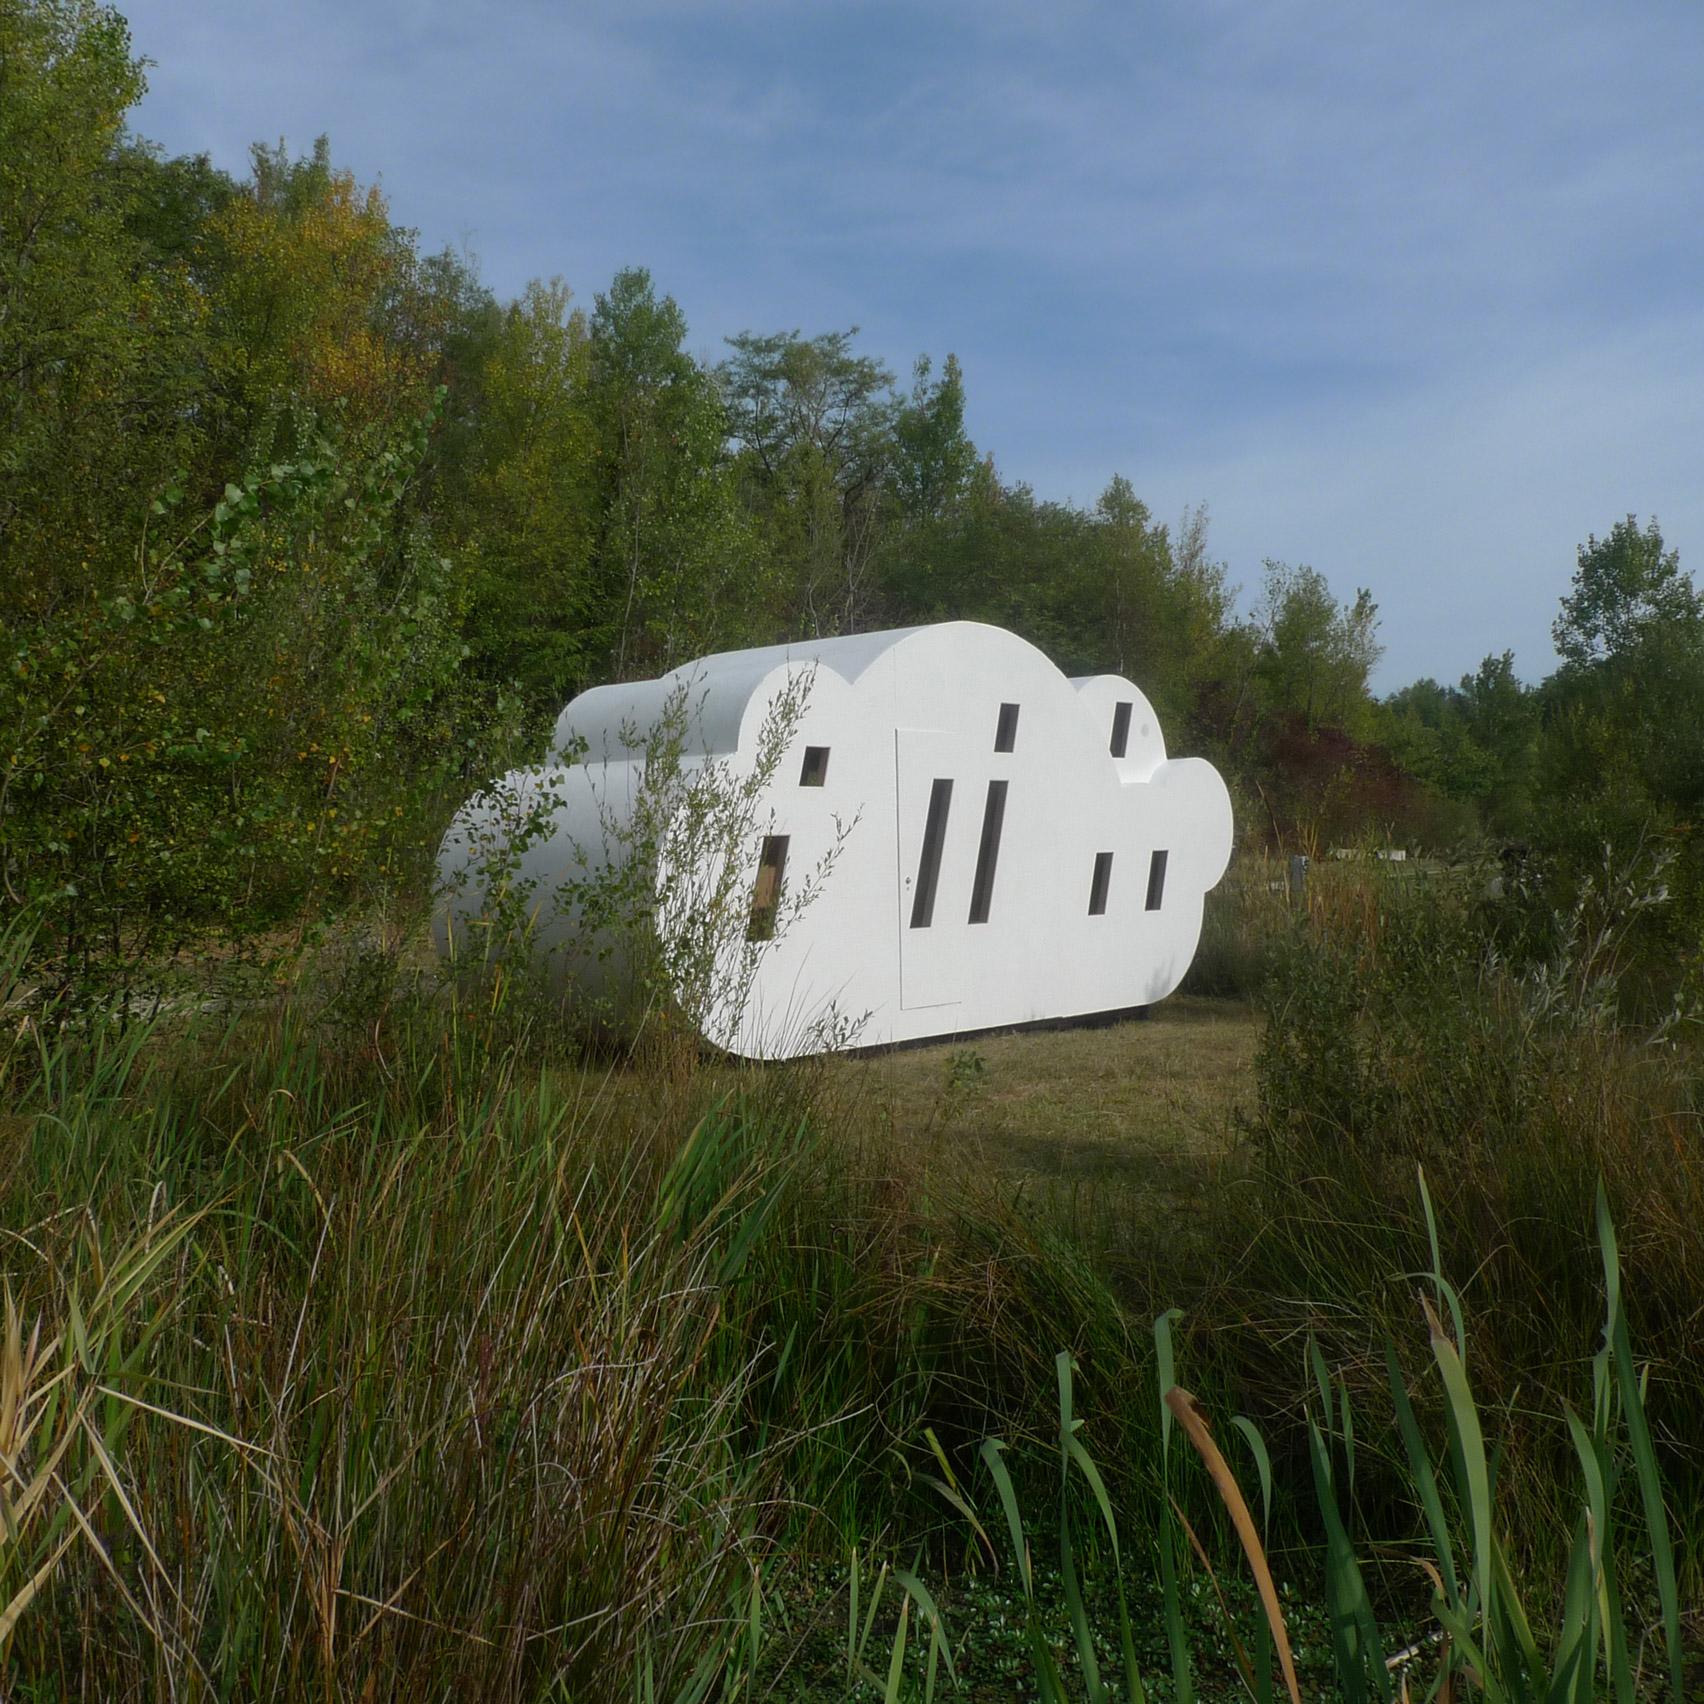 le-nuage-zebra3-buy--sellf-micro-homes-roundups-architecture_dezeen_sq-b.jpg